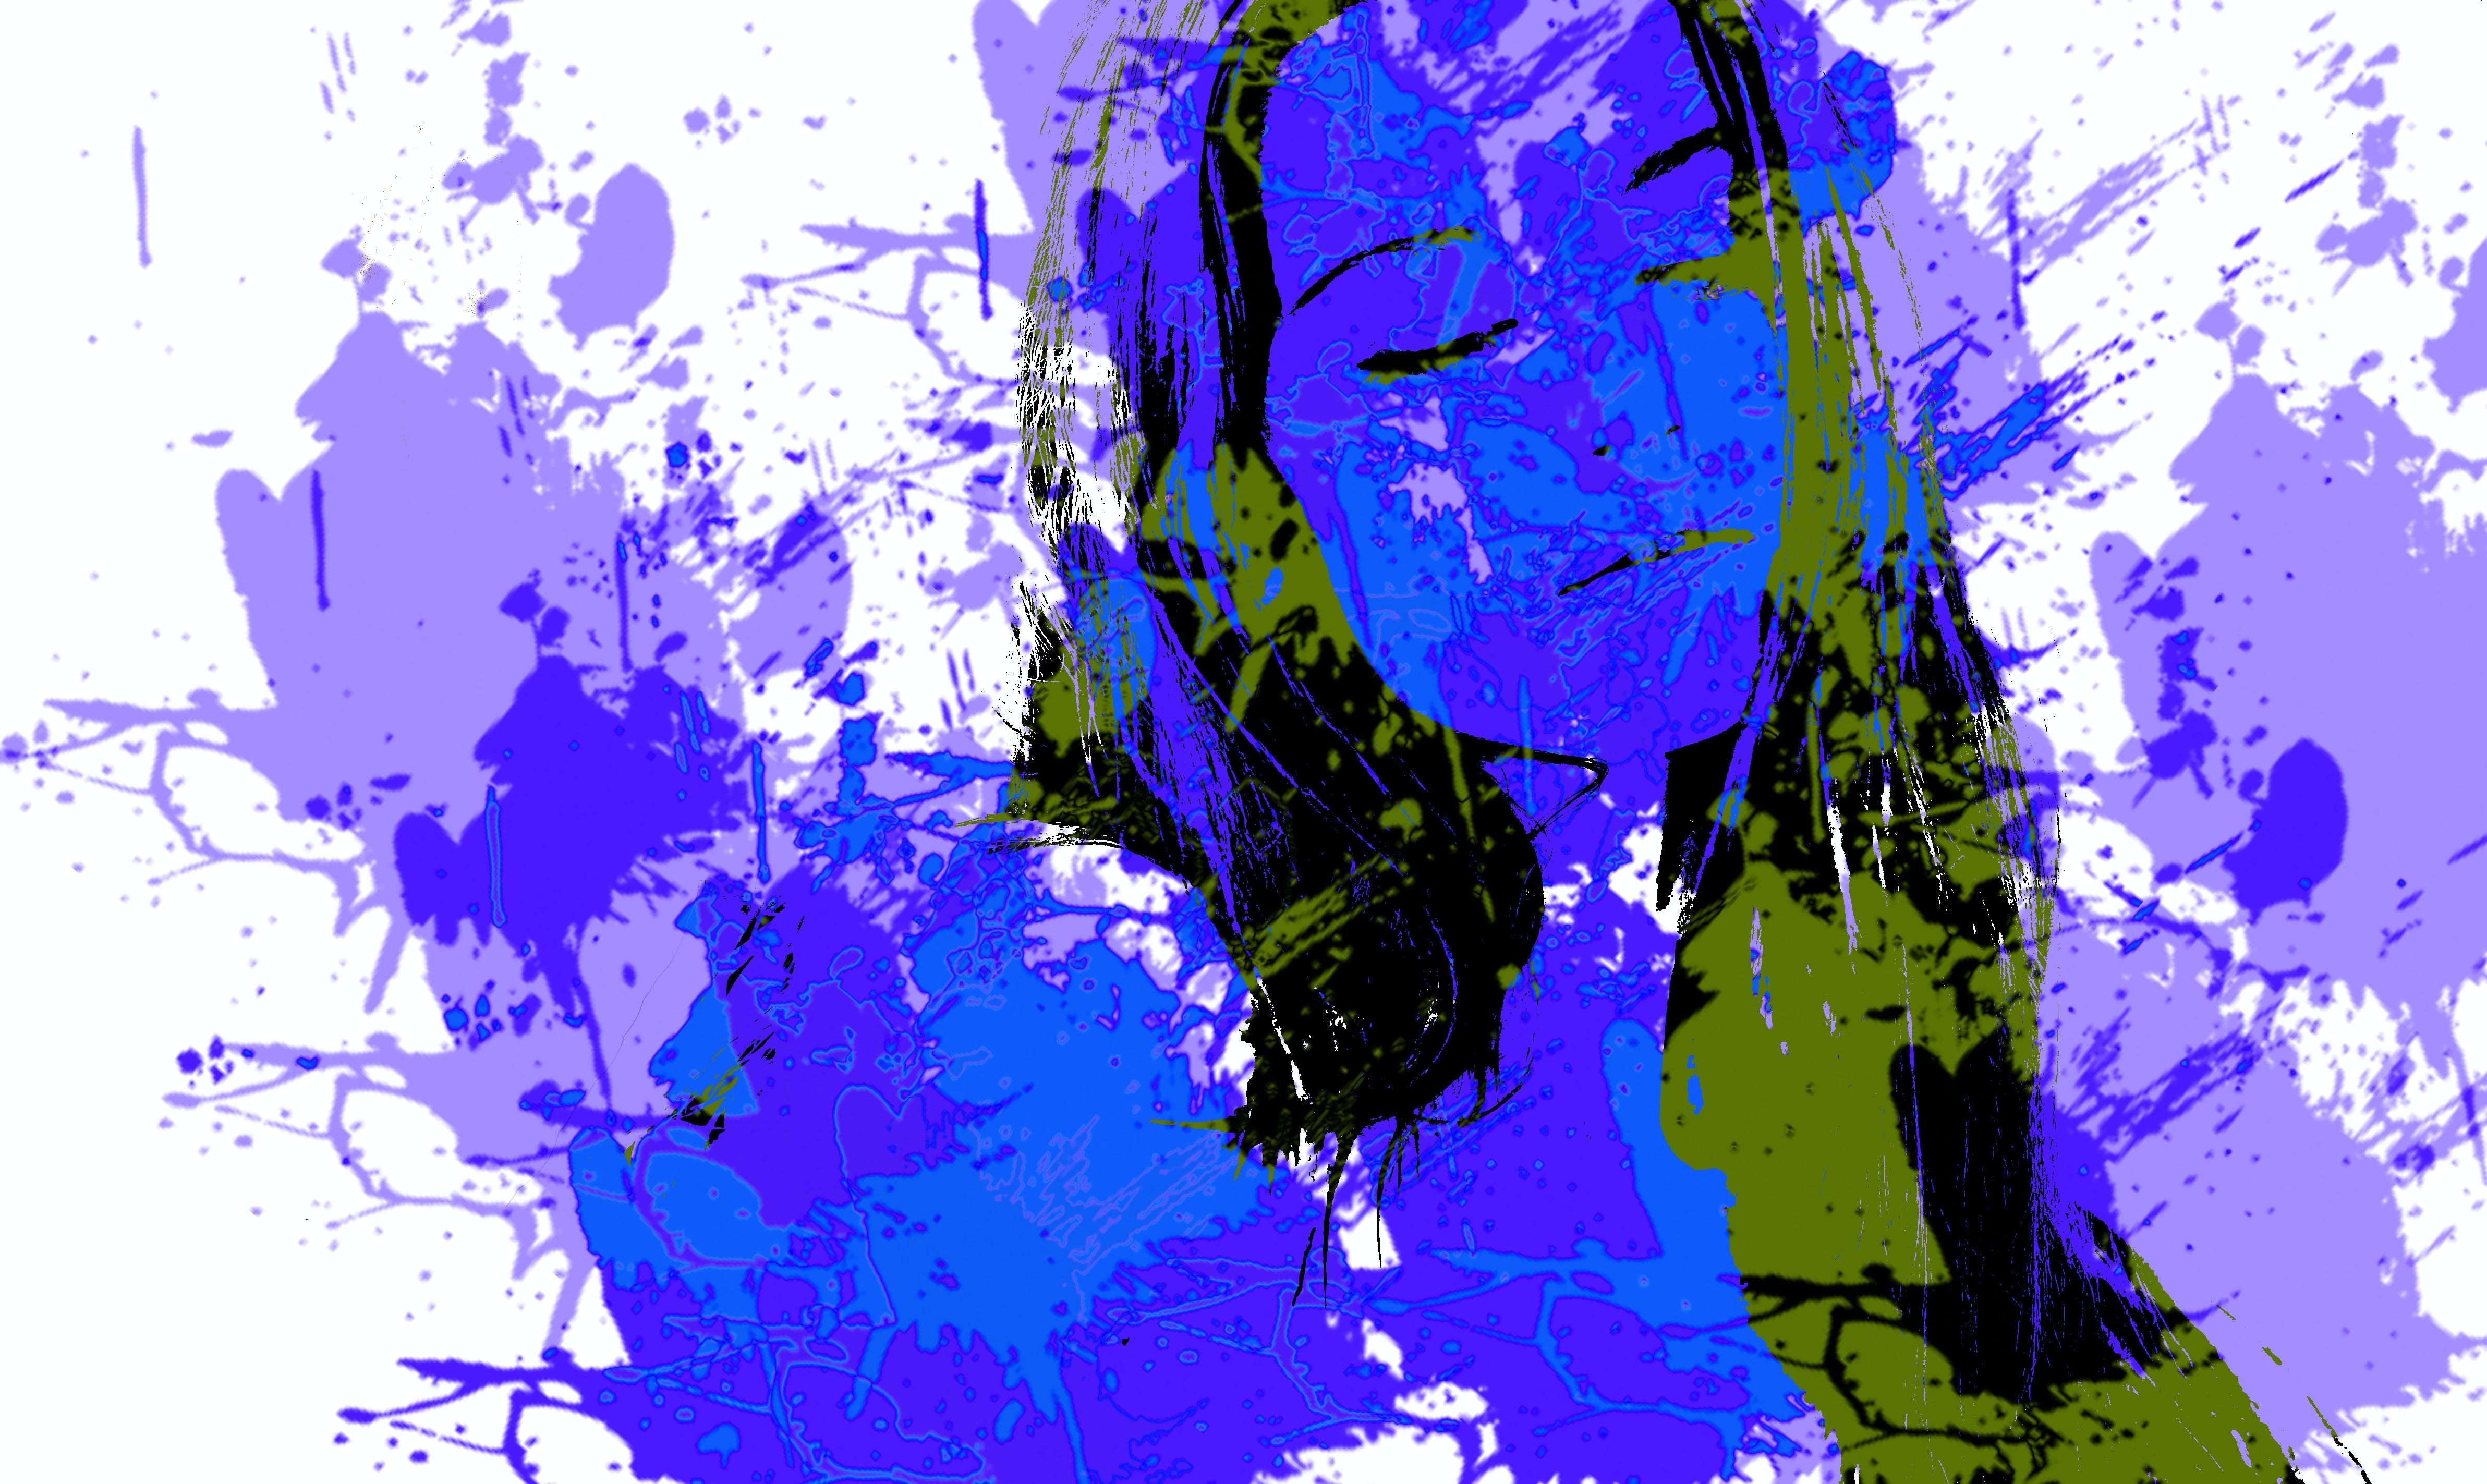 54+ Gambar Abstrak Yang Cantik Terlihat Keren